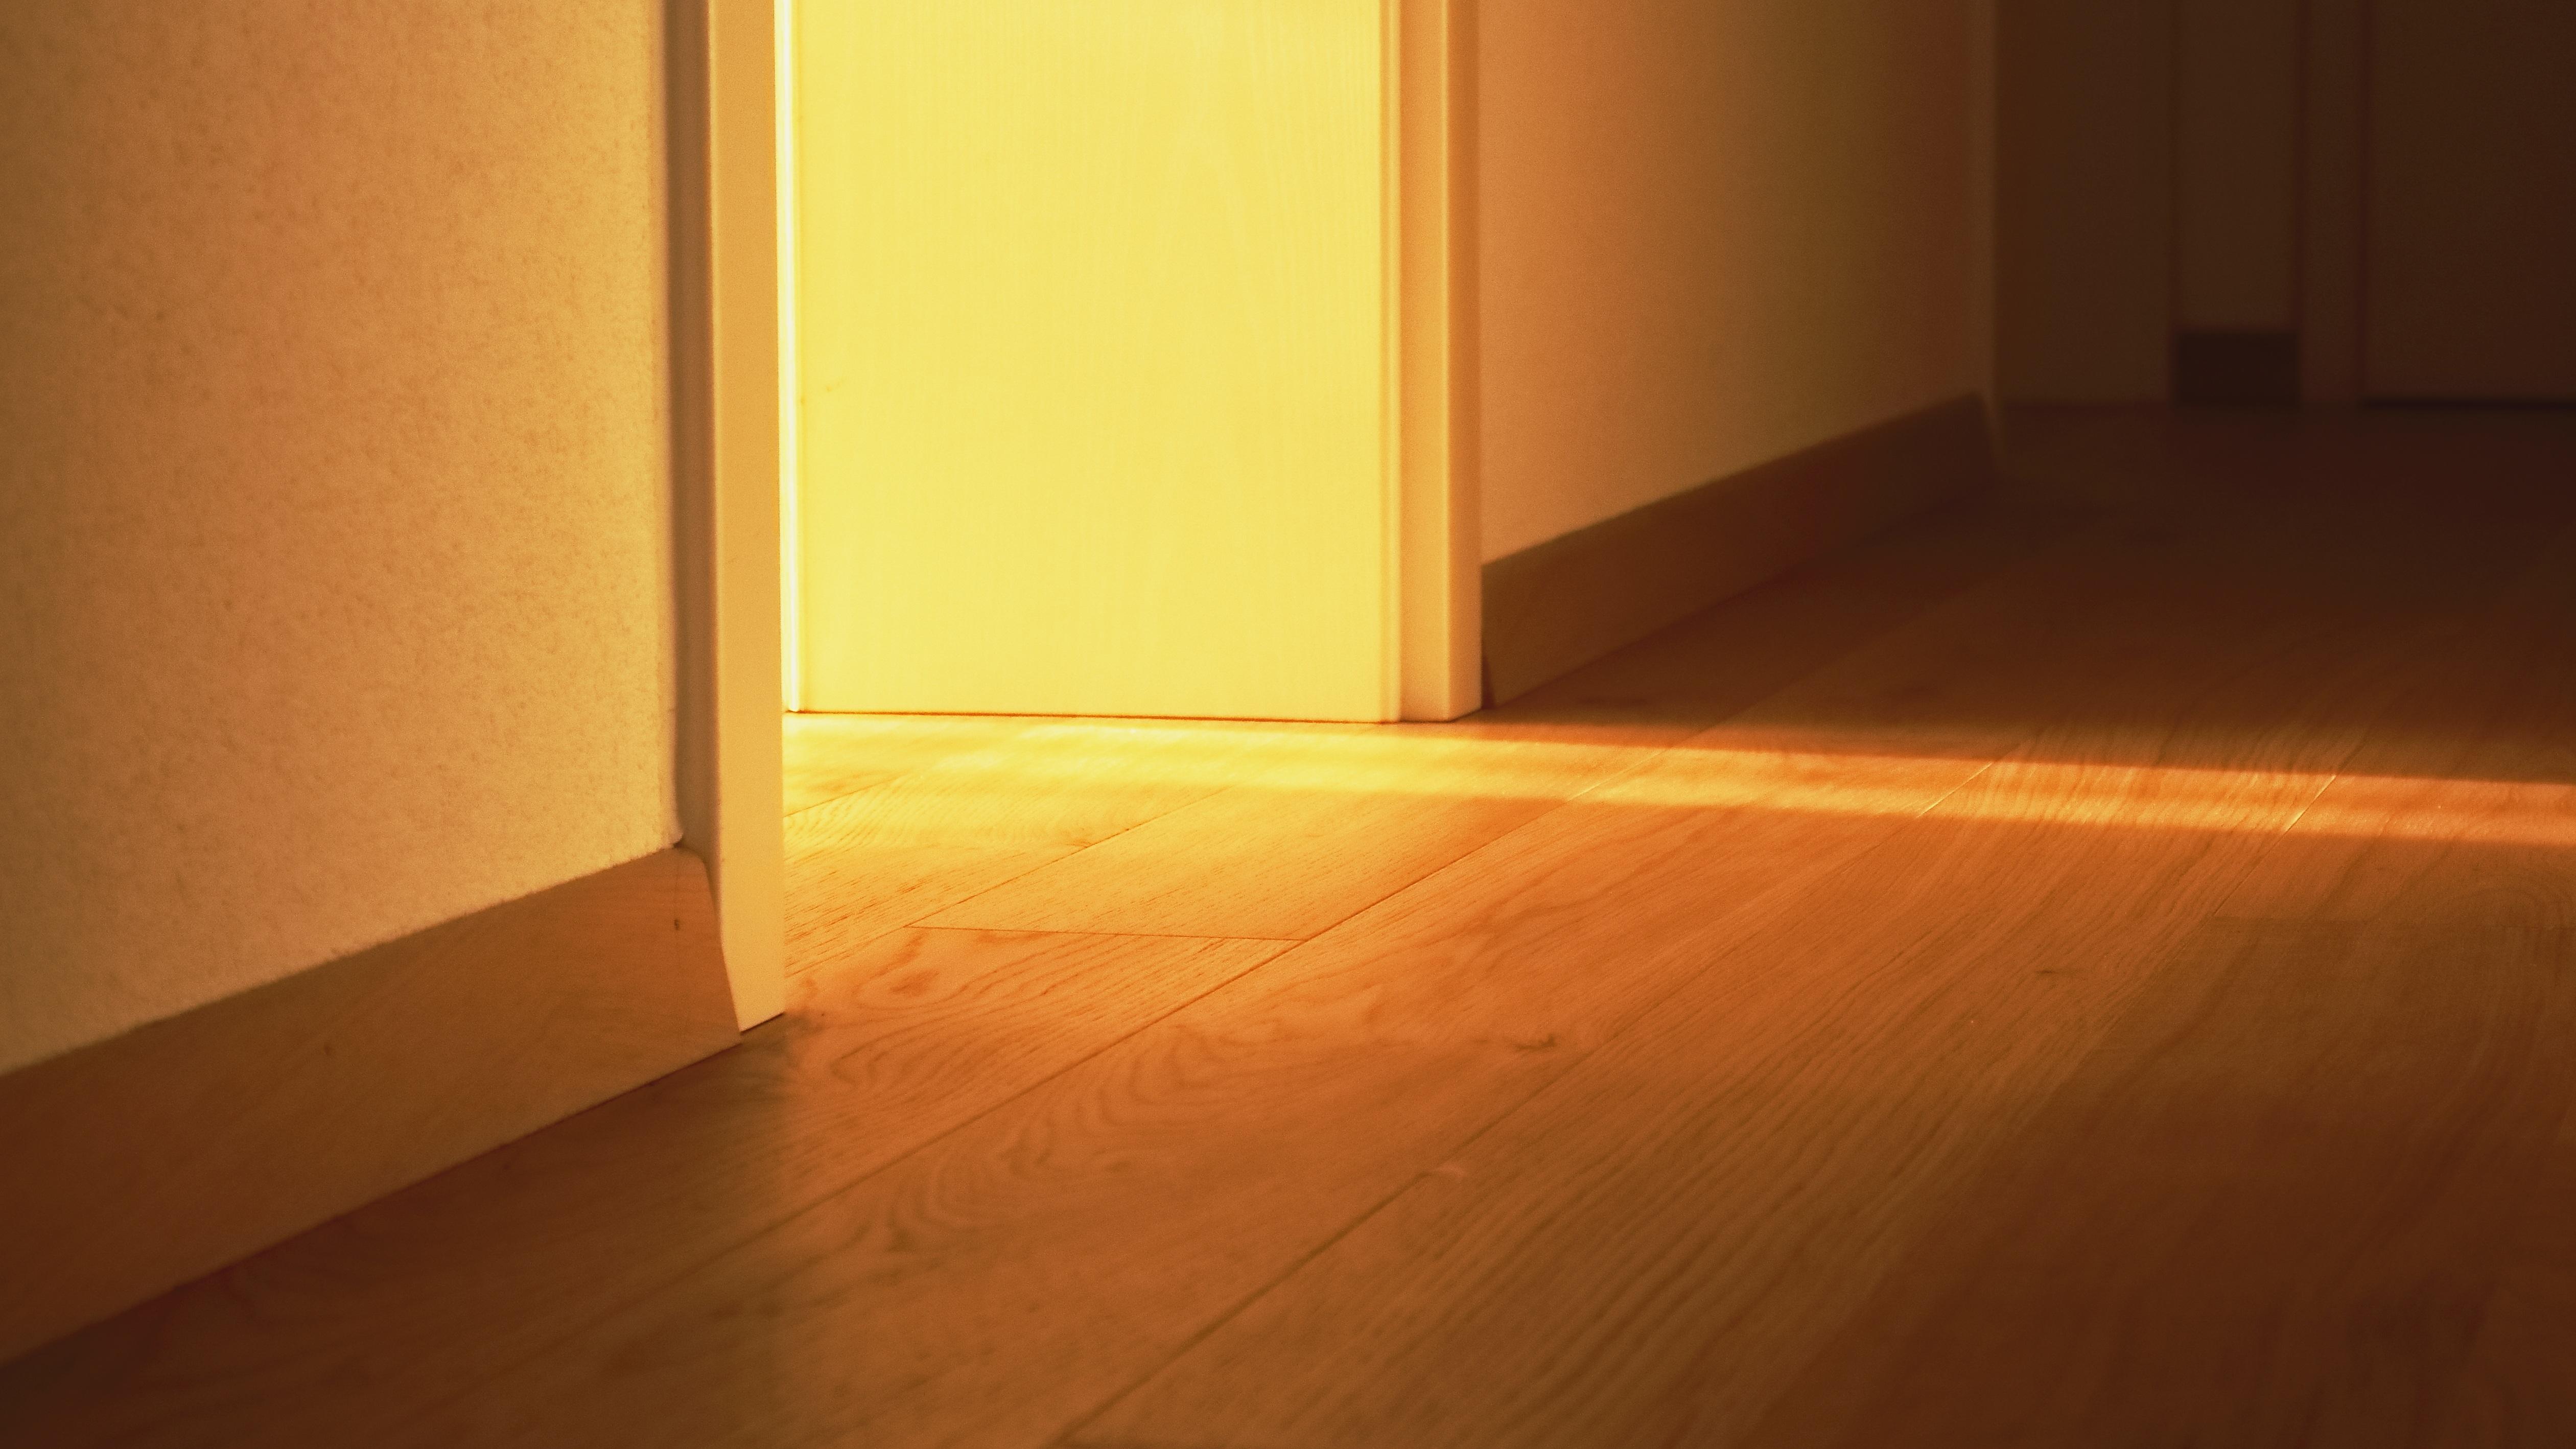 Gratis afbeeldingen : licht architectuur hout grond huis